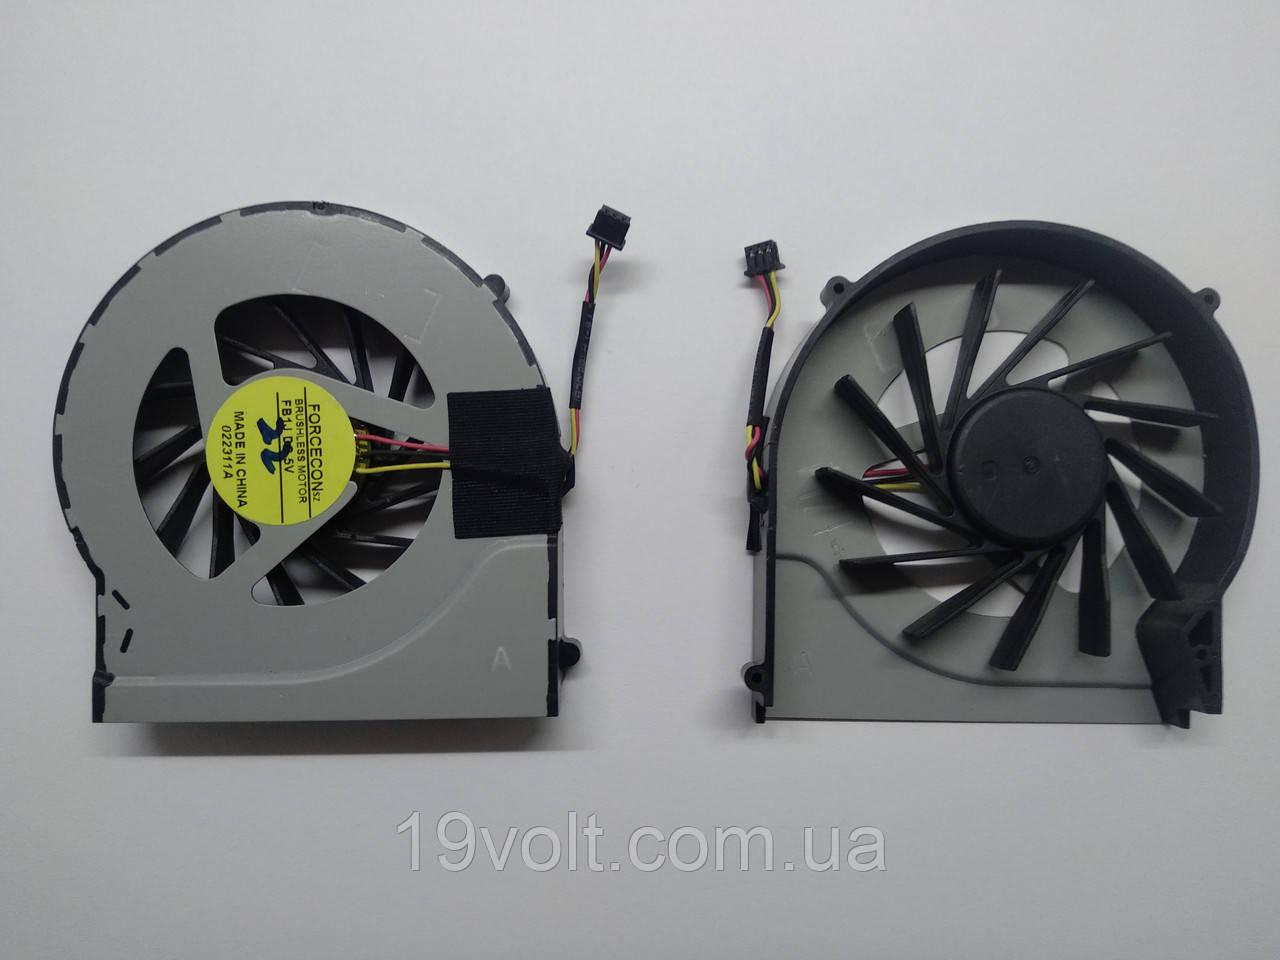 Вентилятор HP Pavilion DV7-4000 DV6-3000 DV6-4000